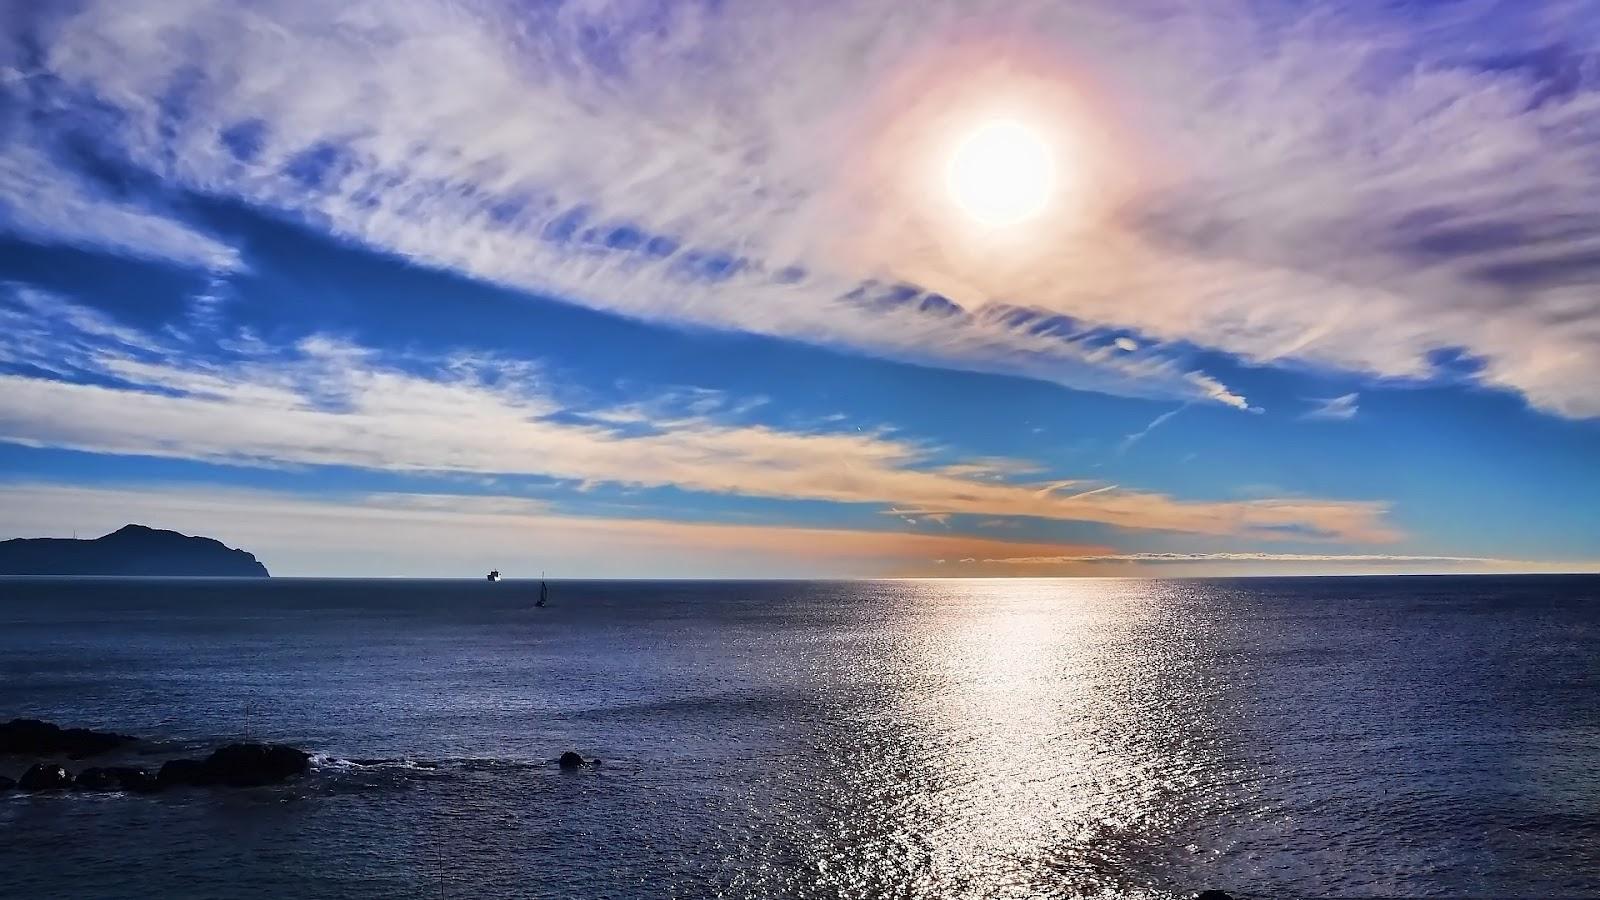 Beautiful Seascape Sunset Full HD Nature Desktop Wallpaper for Laptop 1600x900